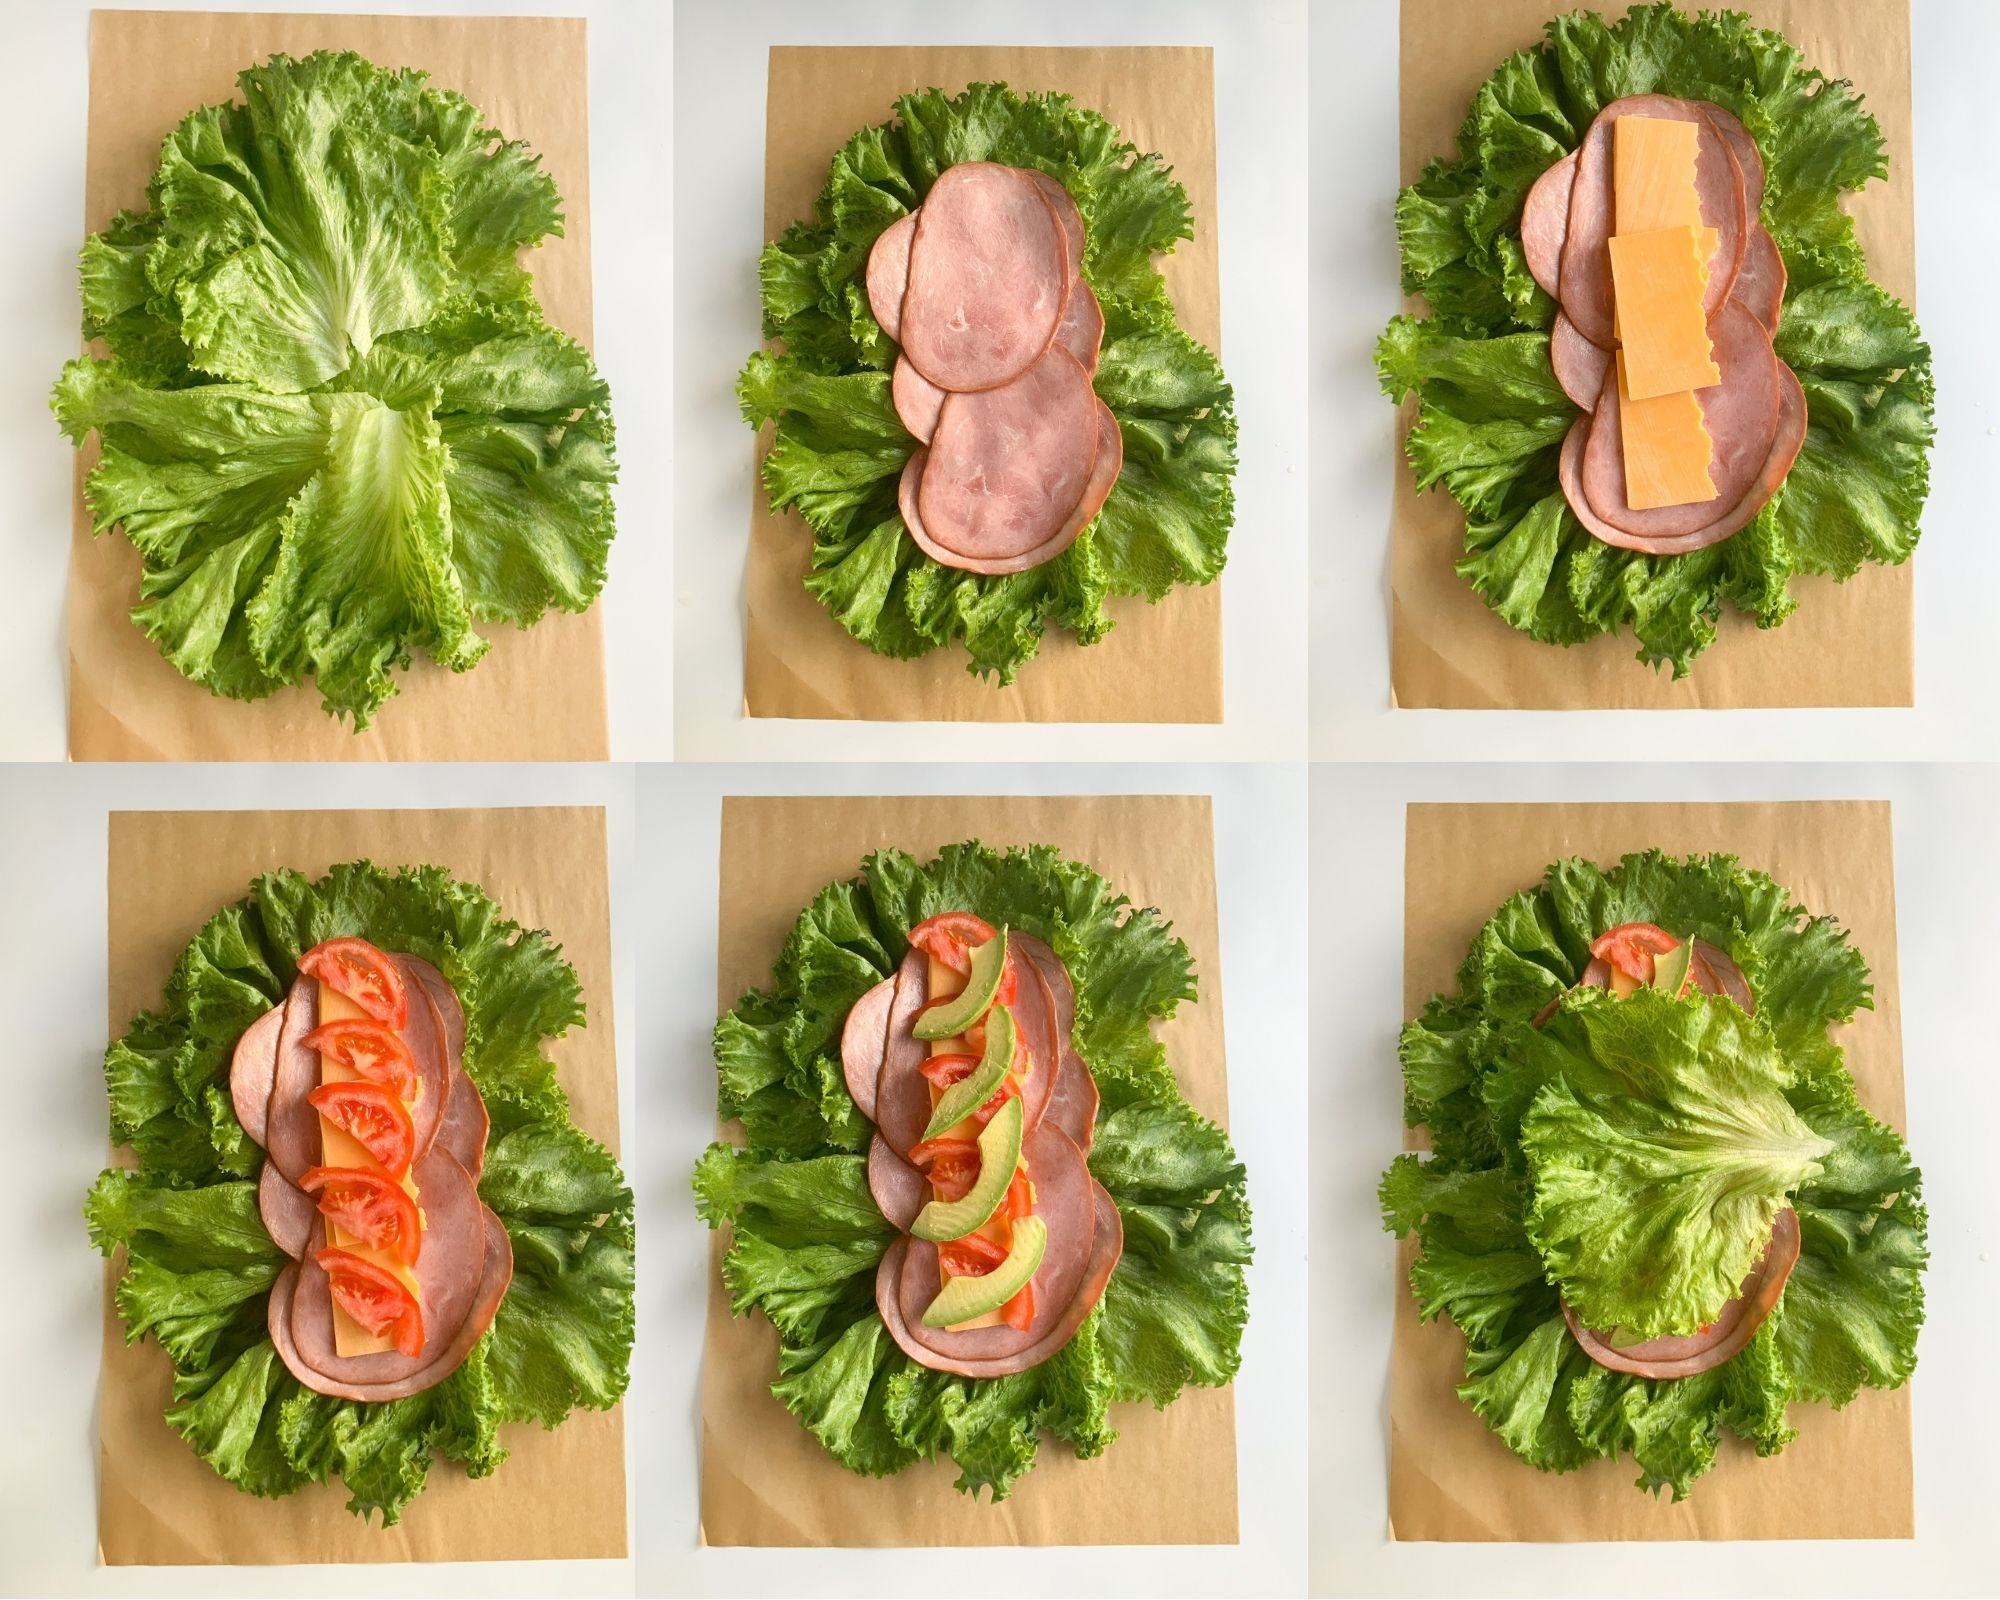 homemade lettuce wrap step by step photos